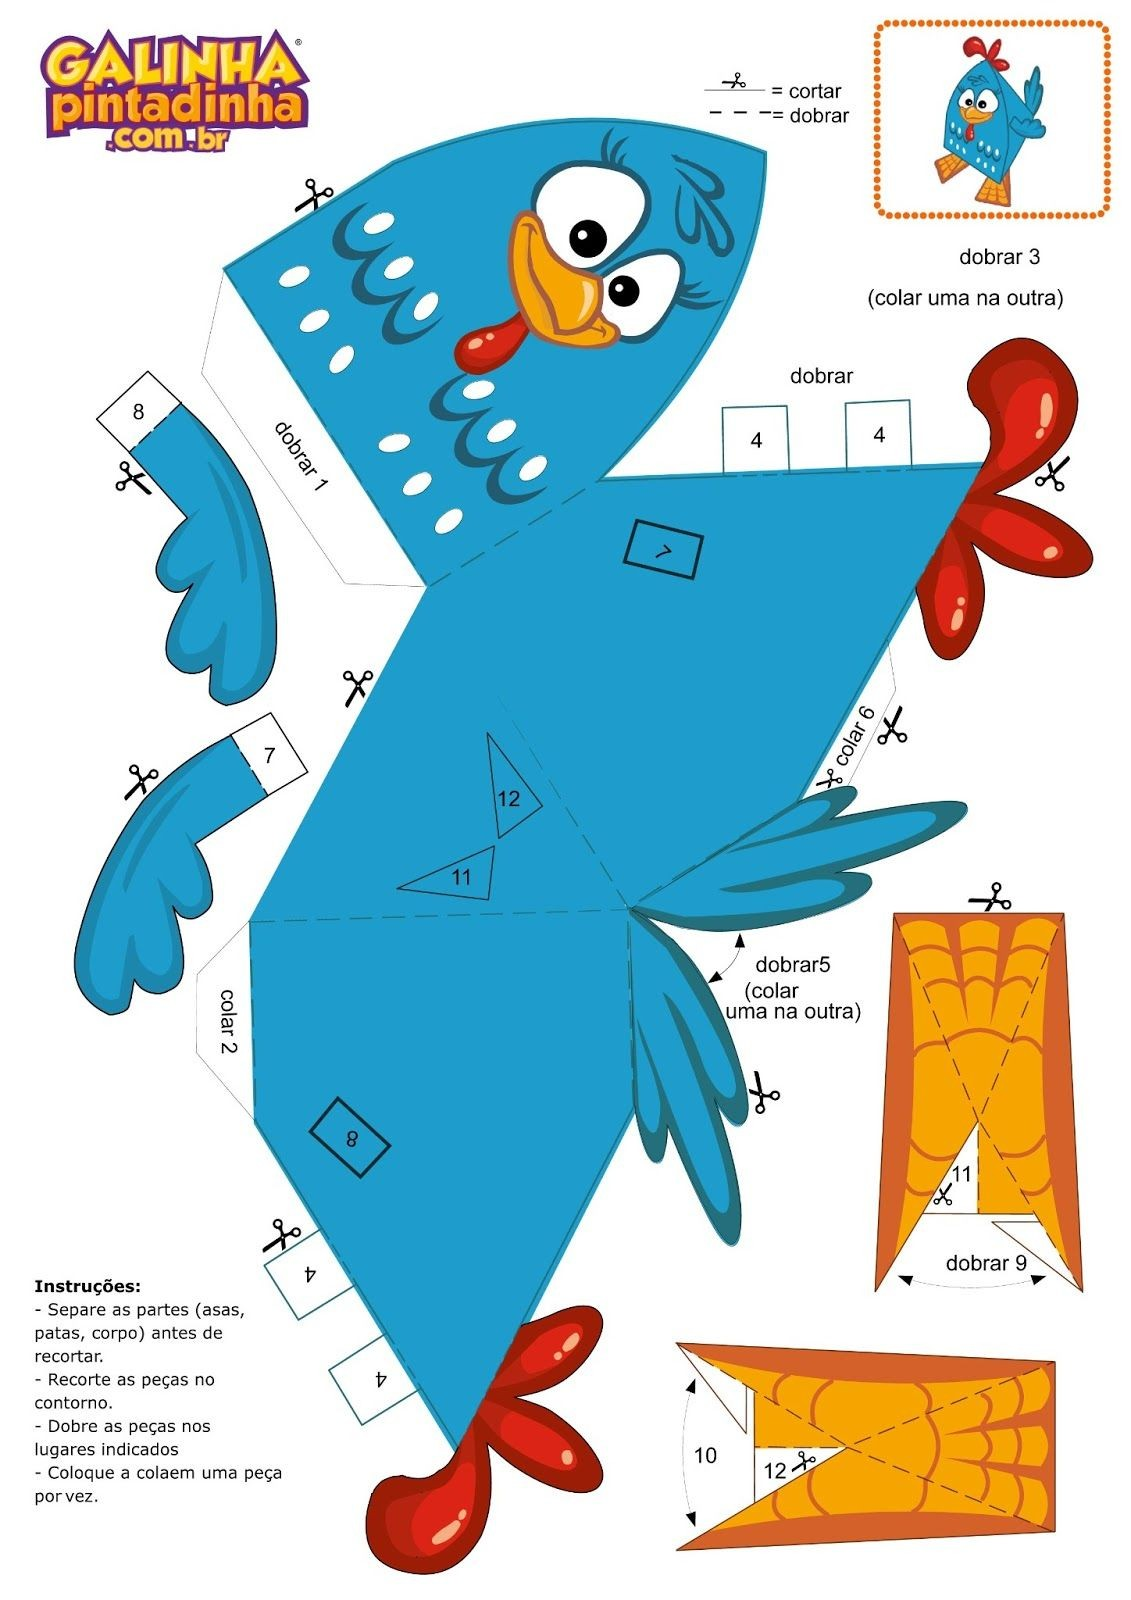 Papercraft toy Kit Festa Galinha Pintadinha Para Imprimir Grátis